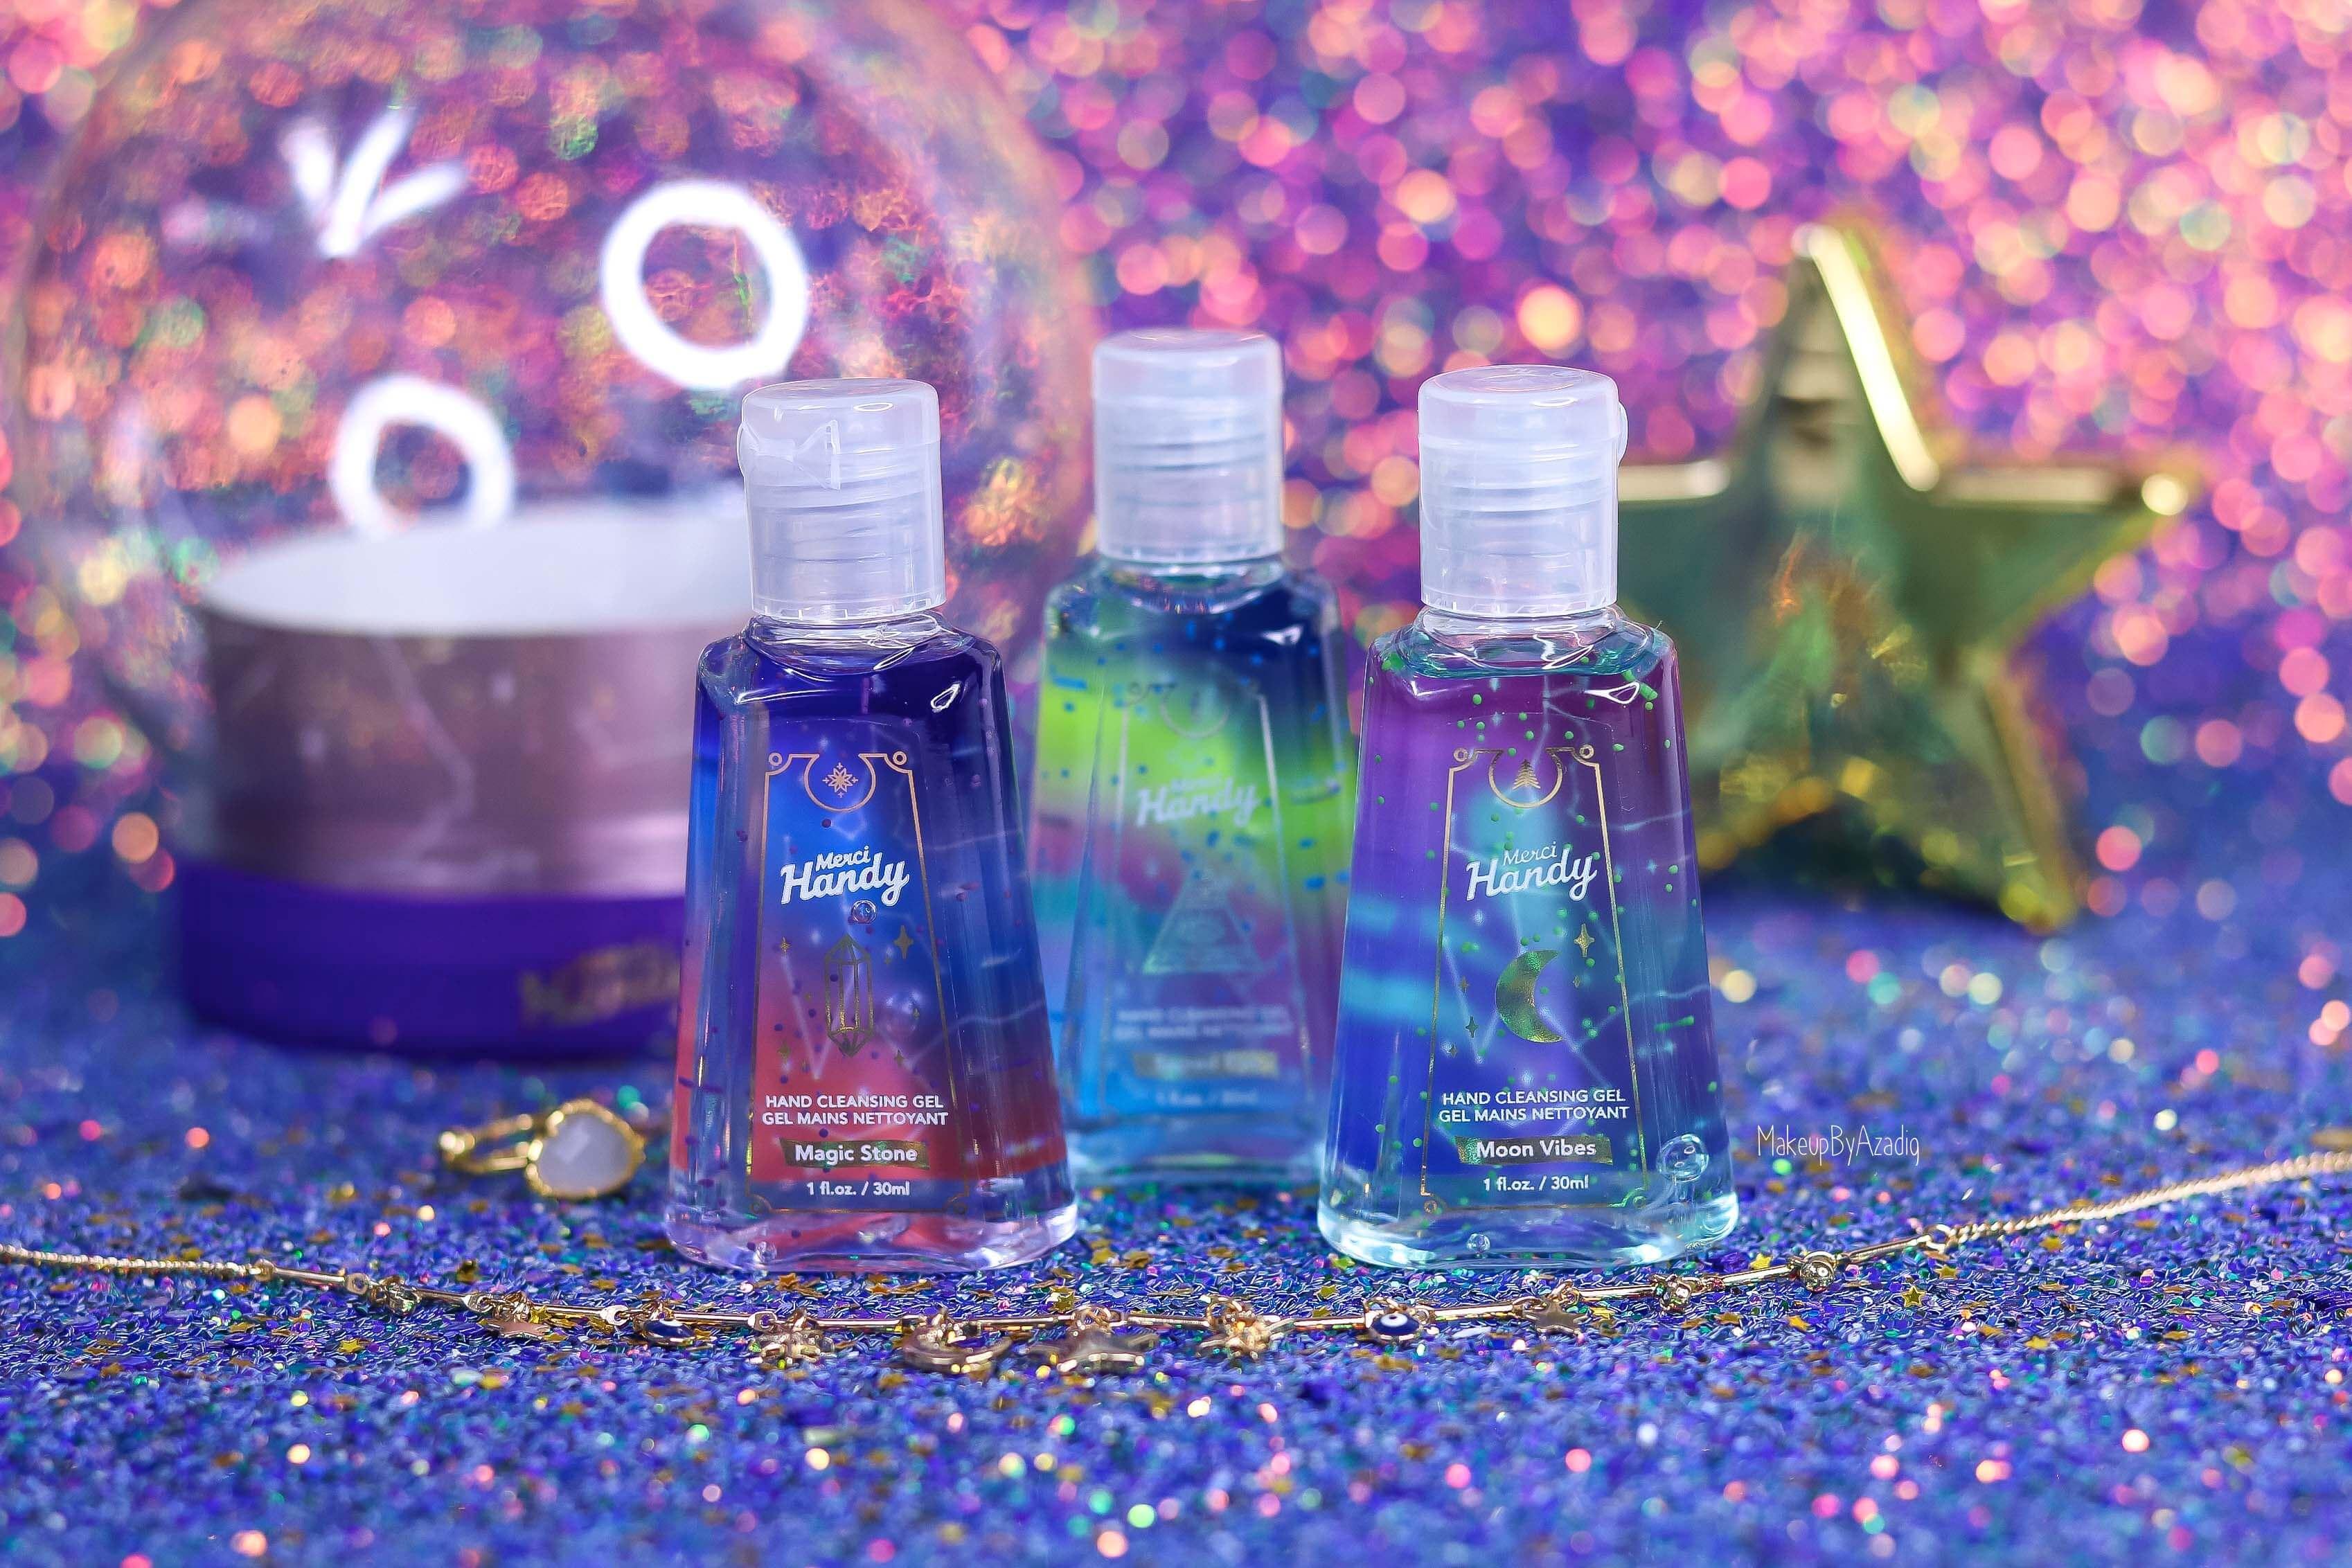 revue-coffret-collection-gel-antibacteriens-merci-handy-crystal-ball-mystique-makeupbyazadig-new-avis-prix-senteur-sephora-france-miniature